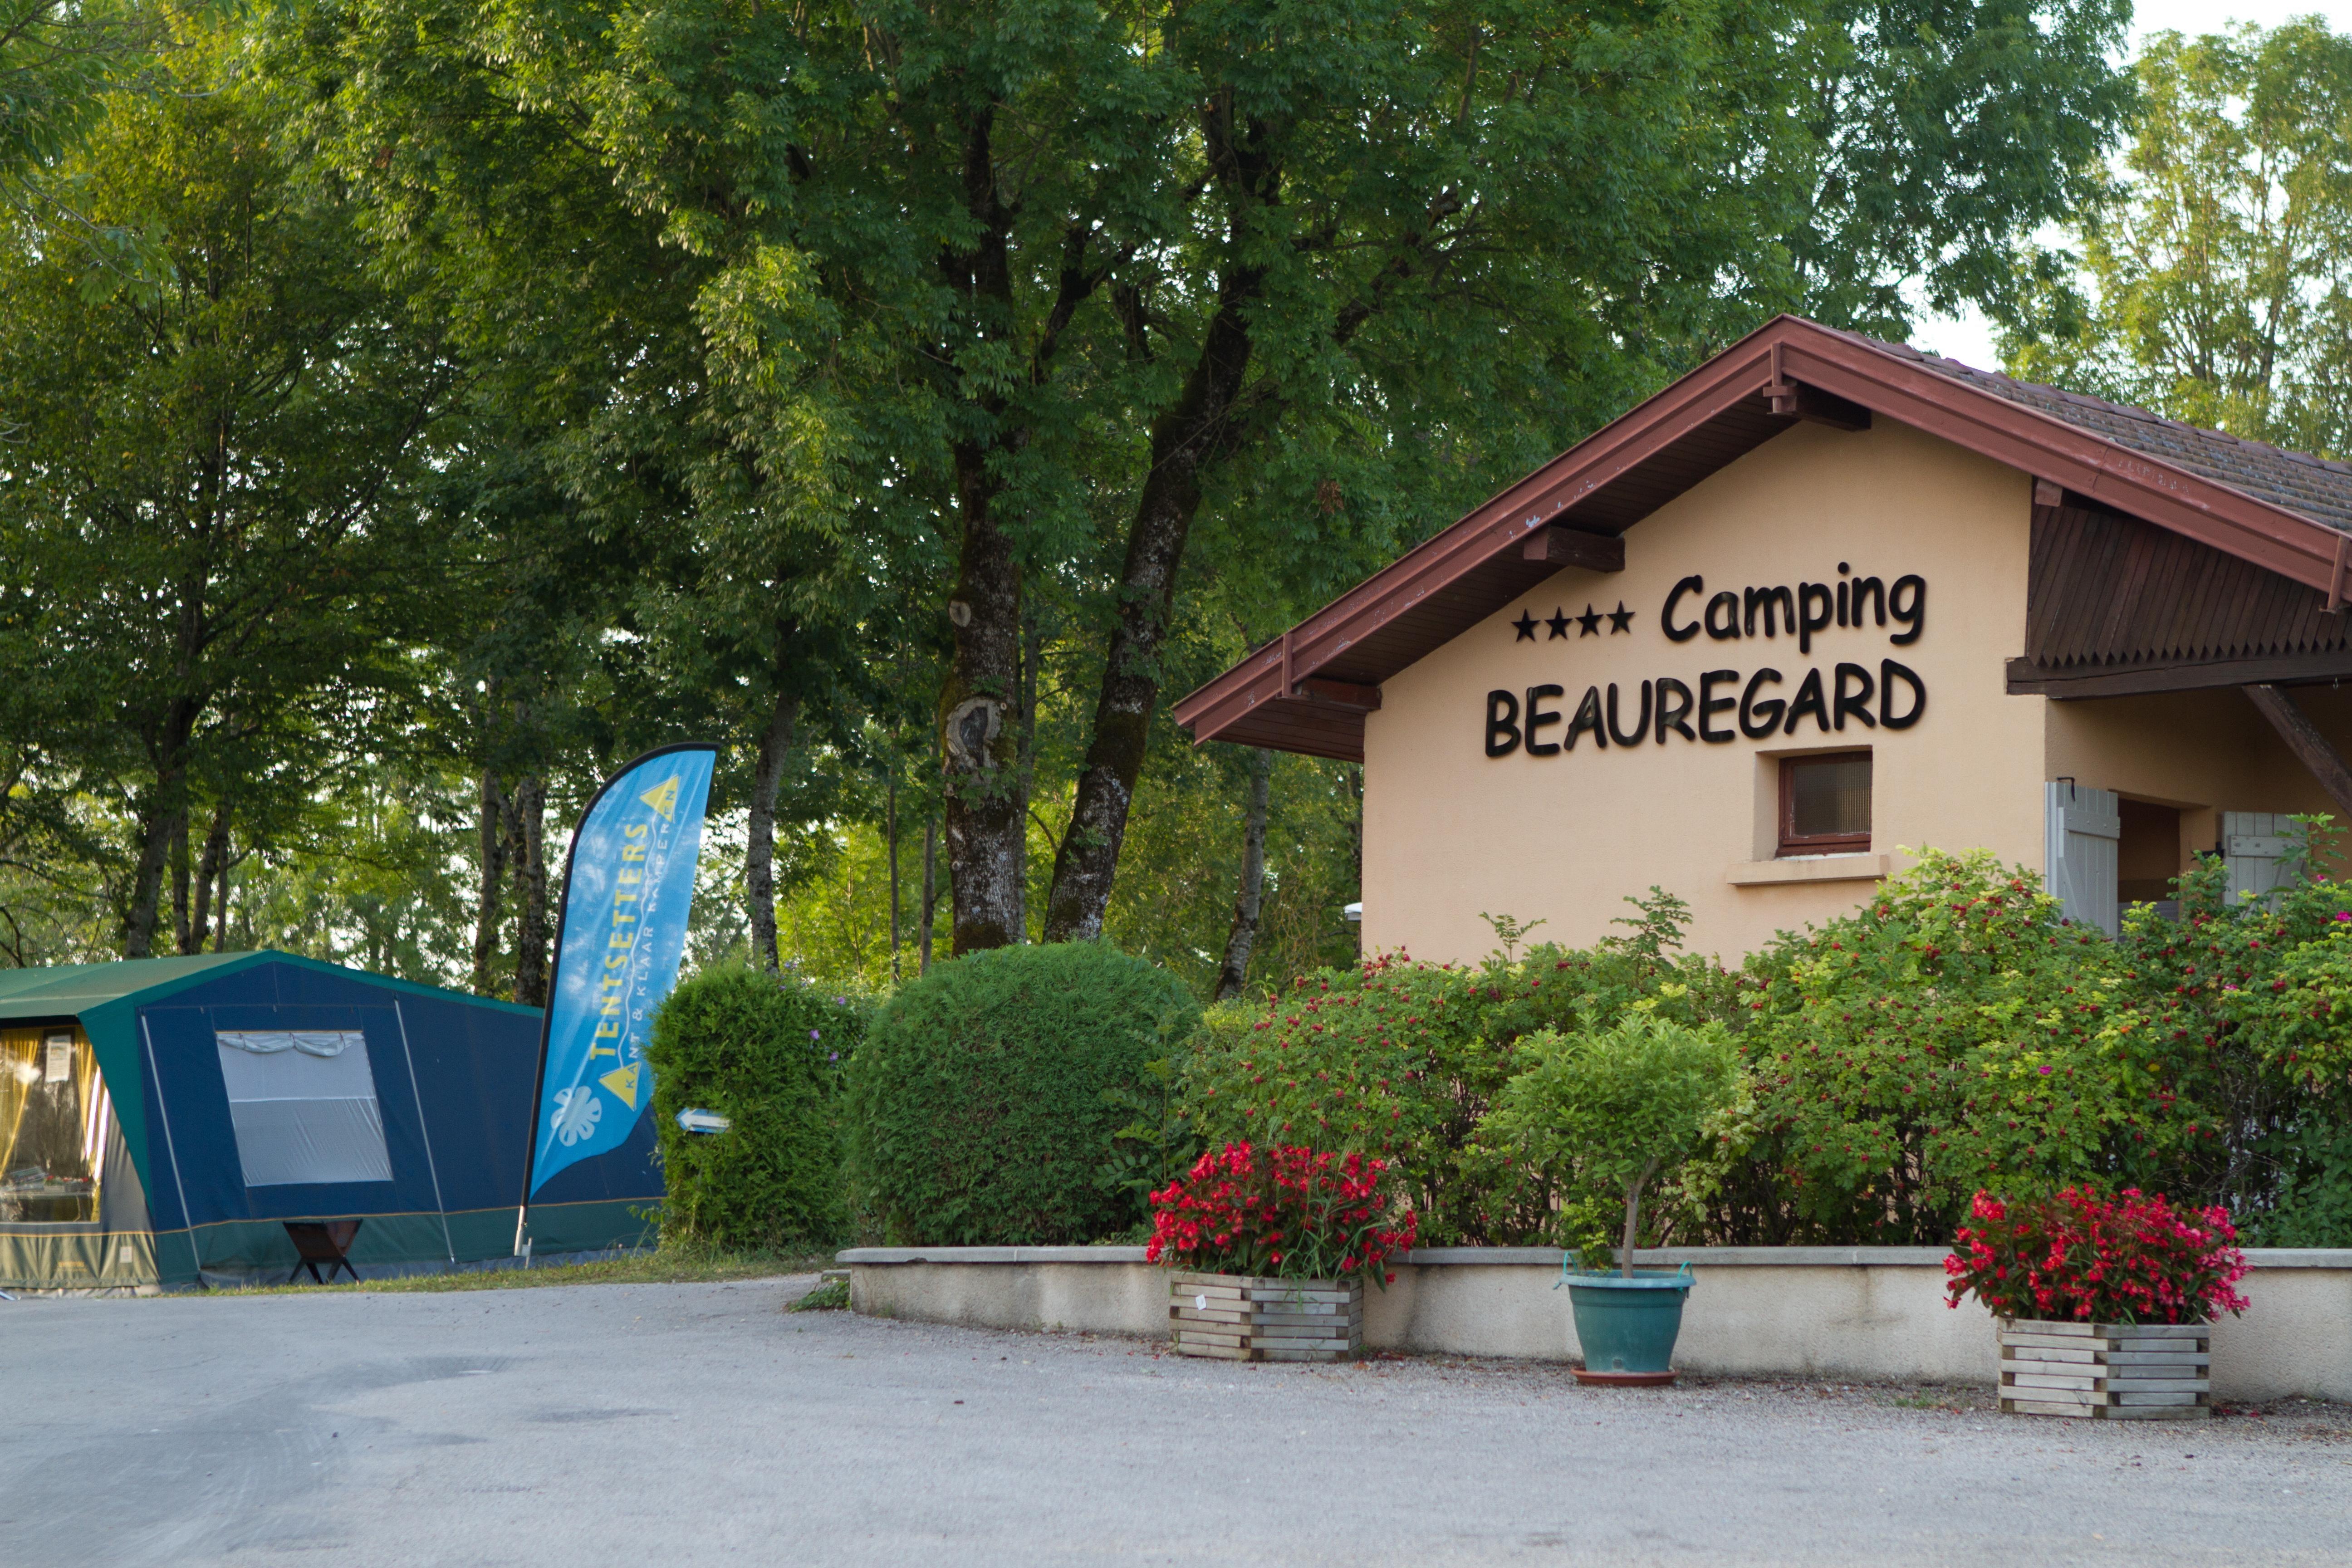 Entree van camping Beauregard